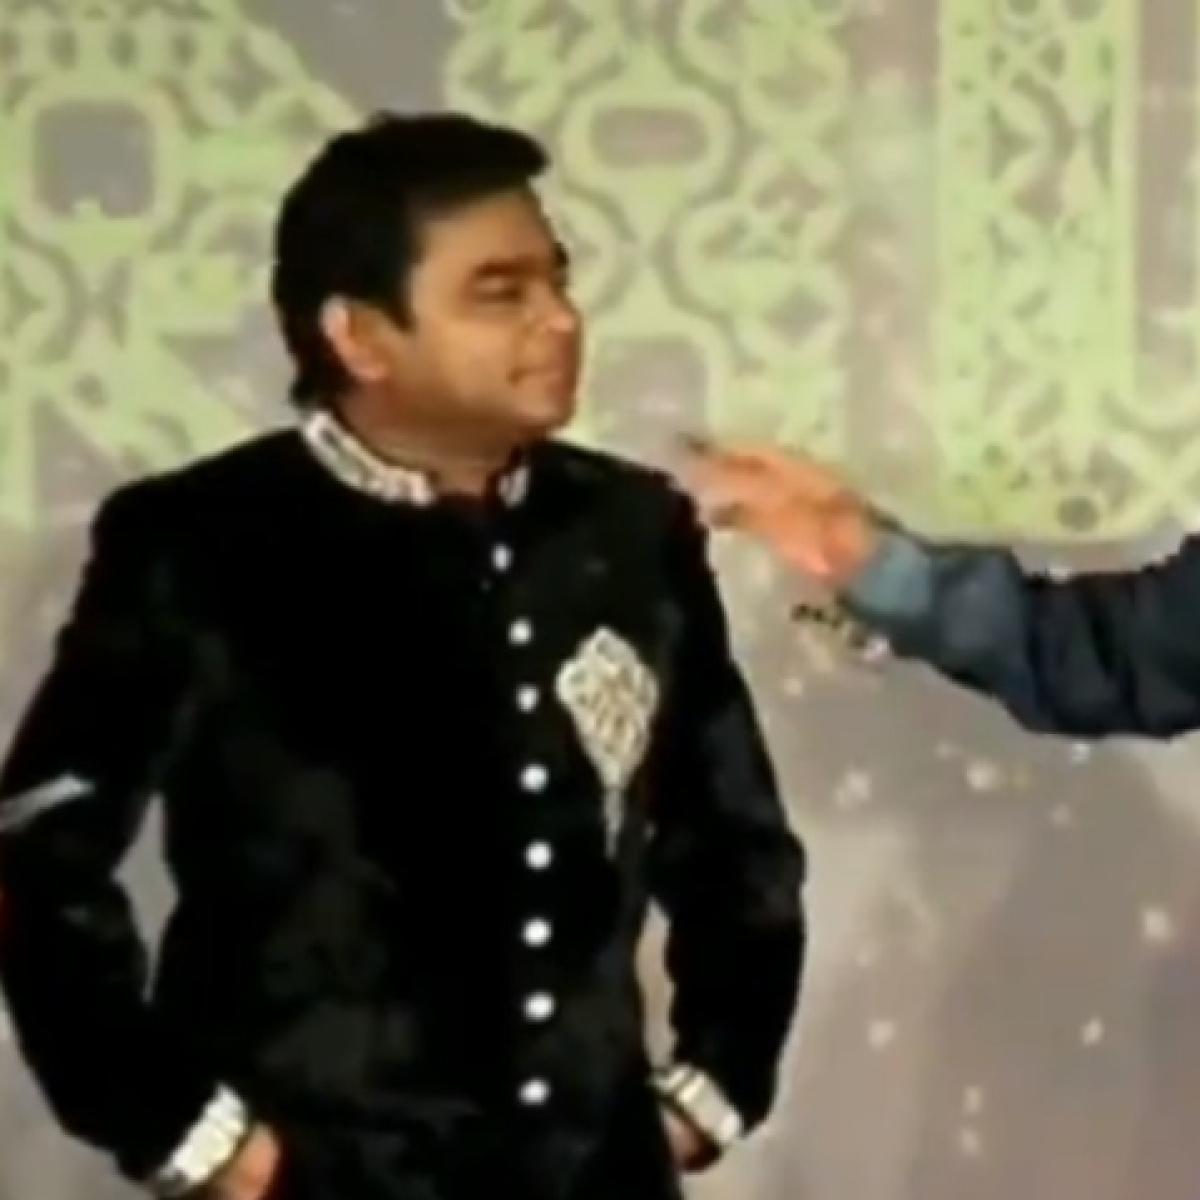 Savage: When AR Rahman clapped back at Salman Khan for calling him 'average'